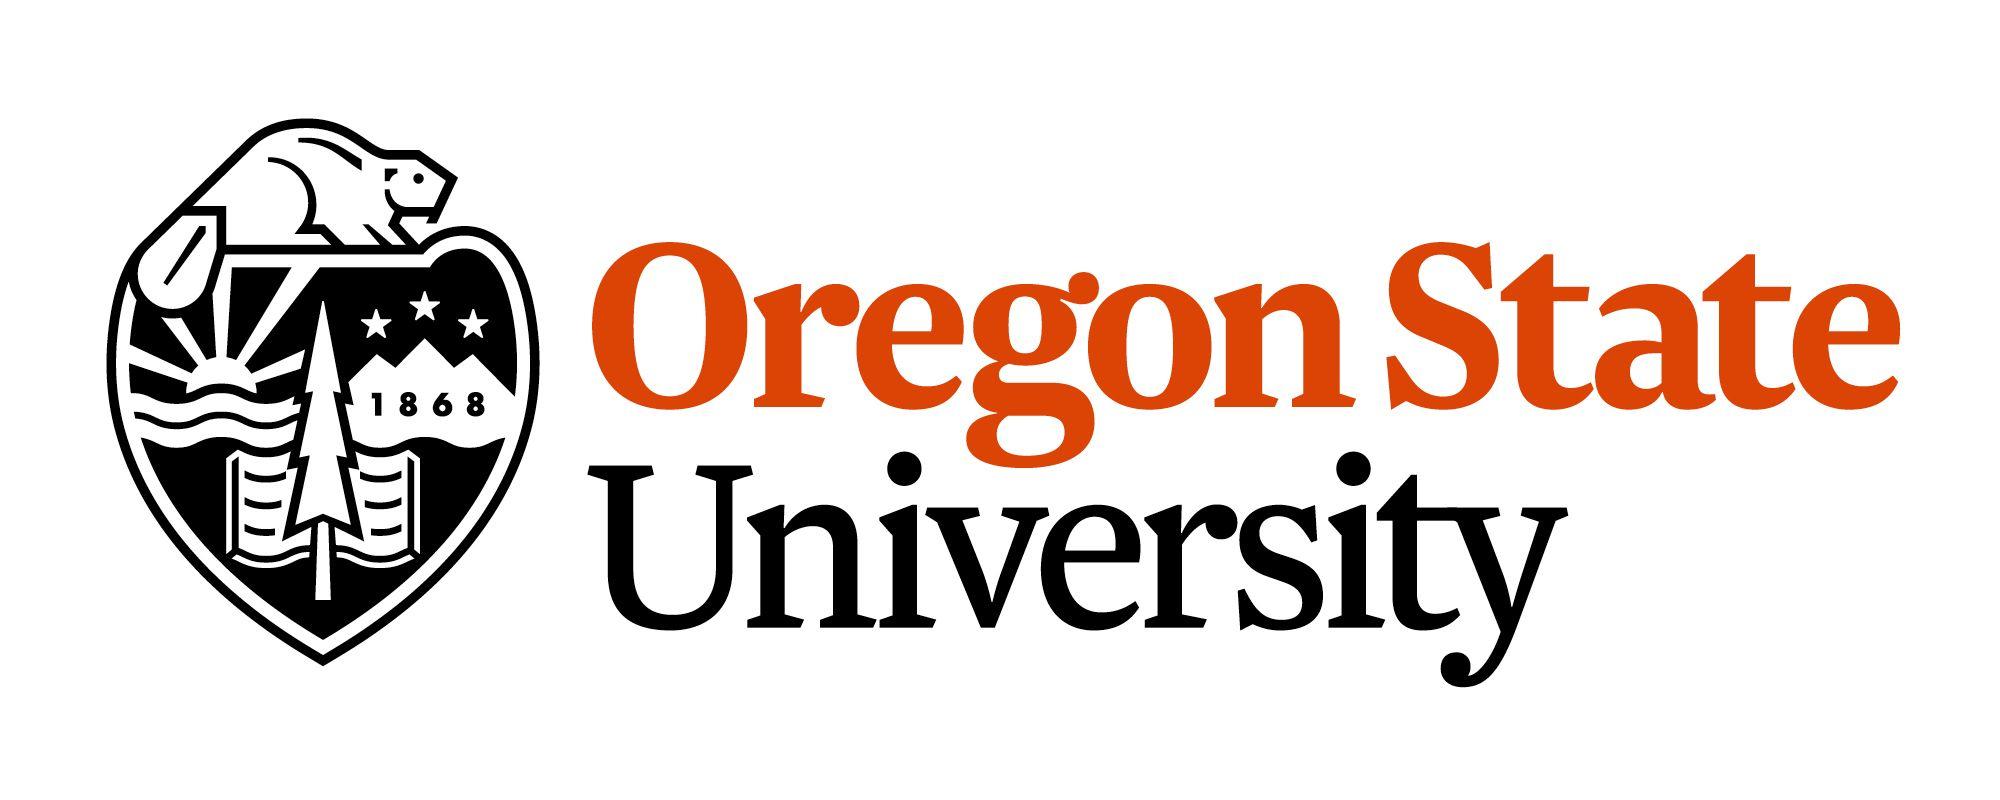 Do. Edu Guest Post on Oregon State University - Oregonstate. edu DA87